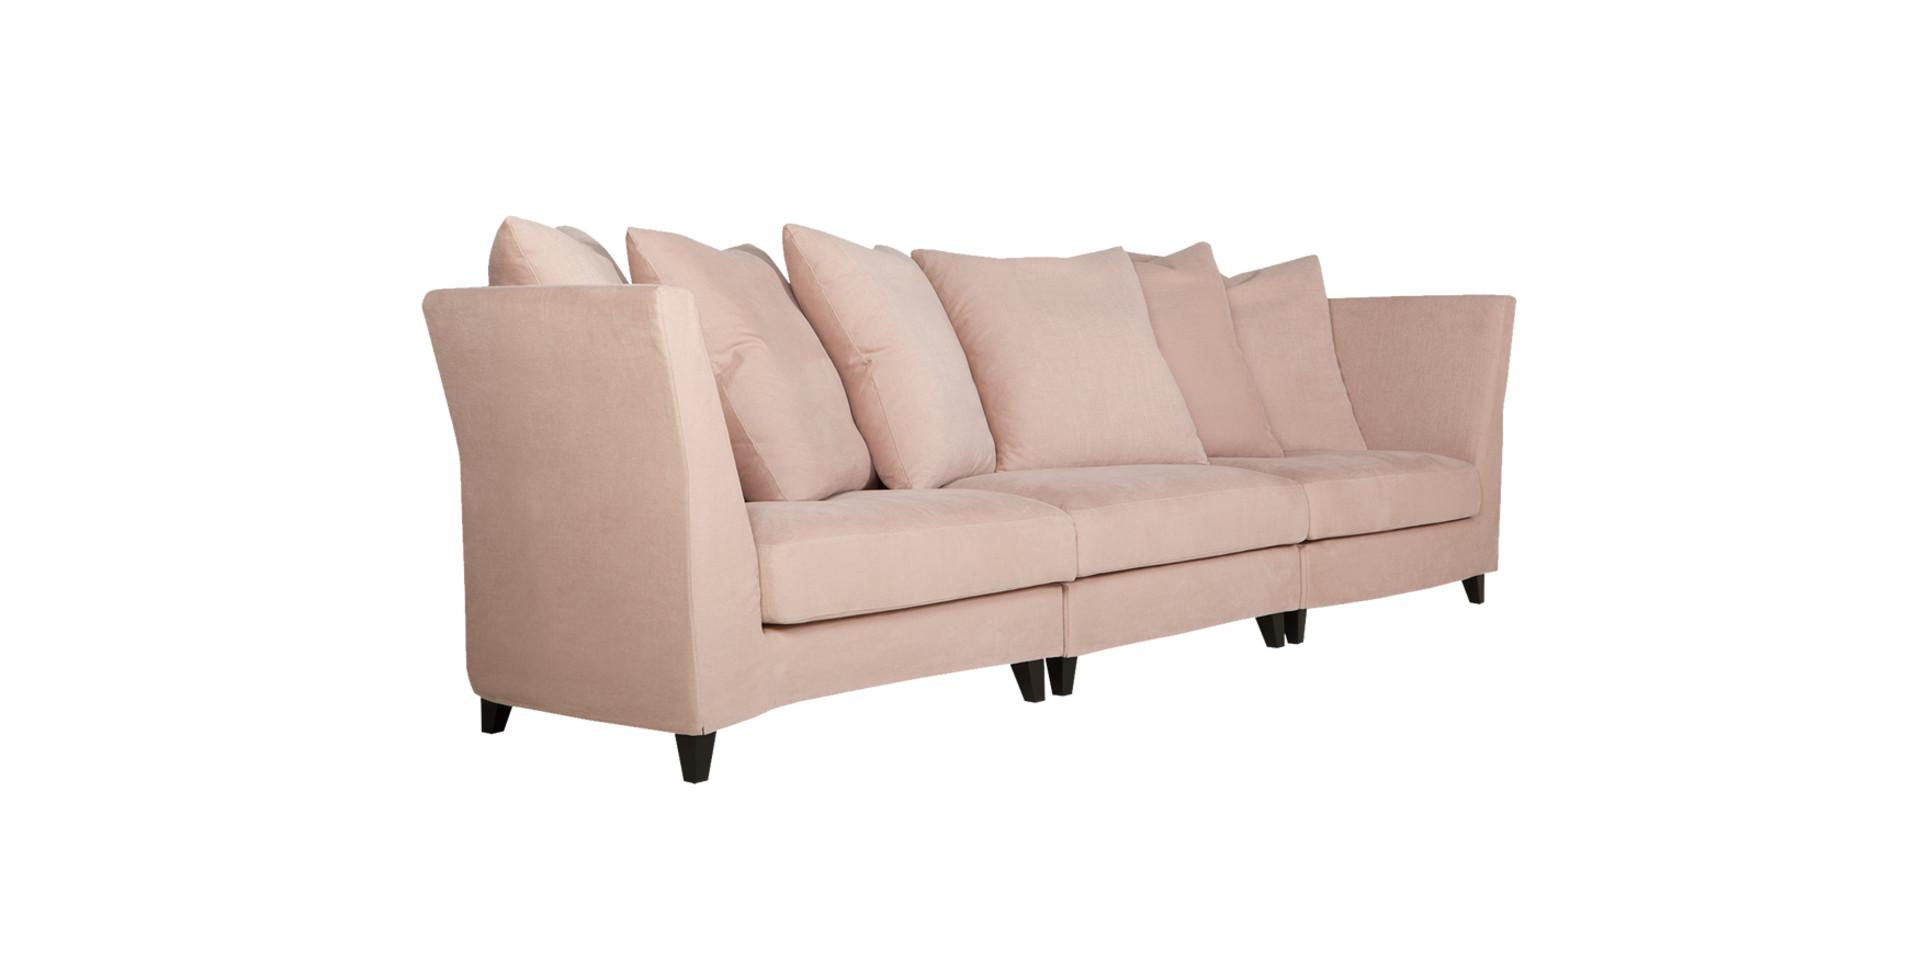 sits-saga-canape-set1_caleido2990_powder_pink_2